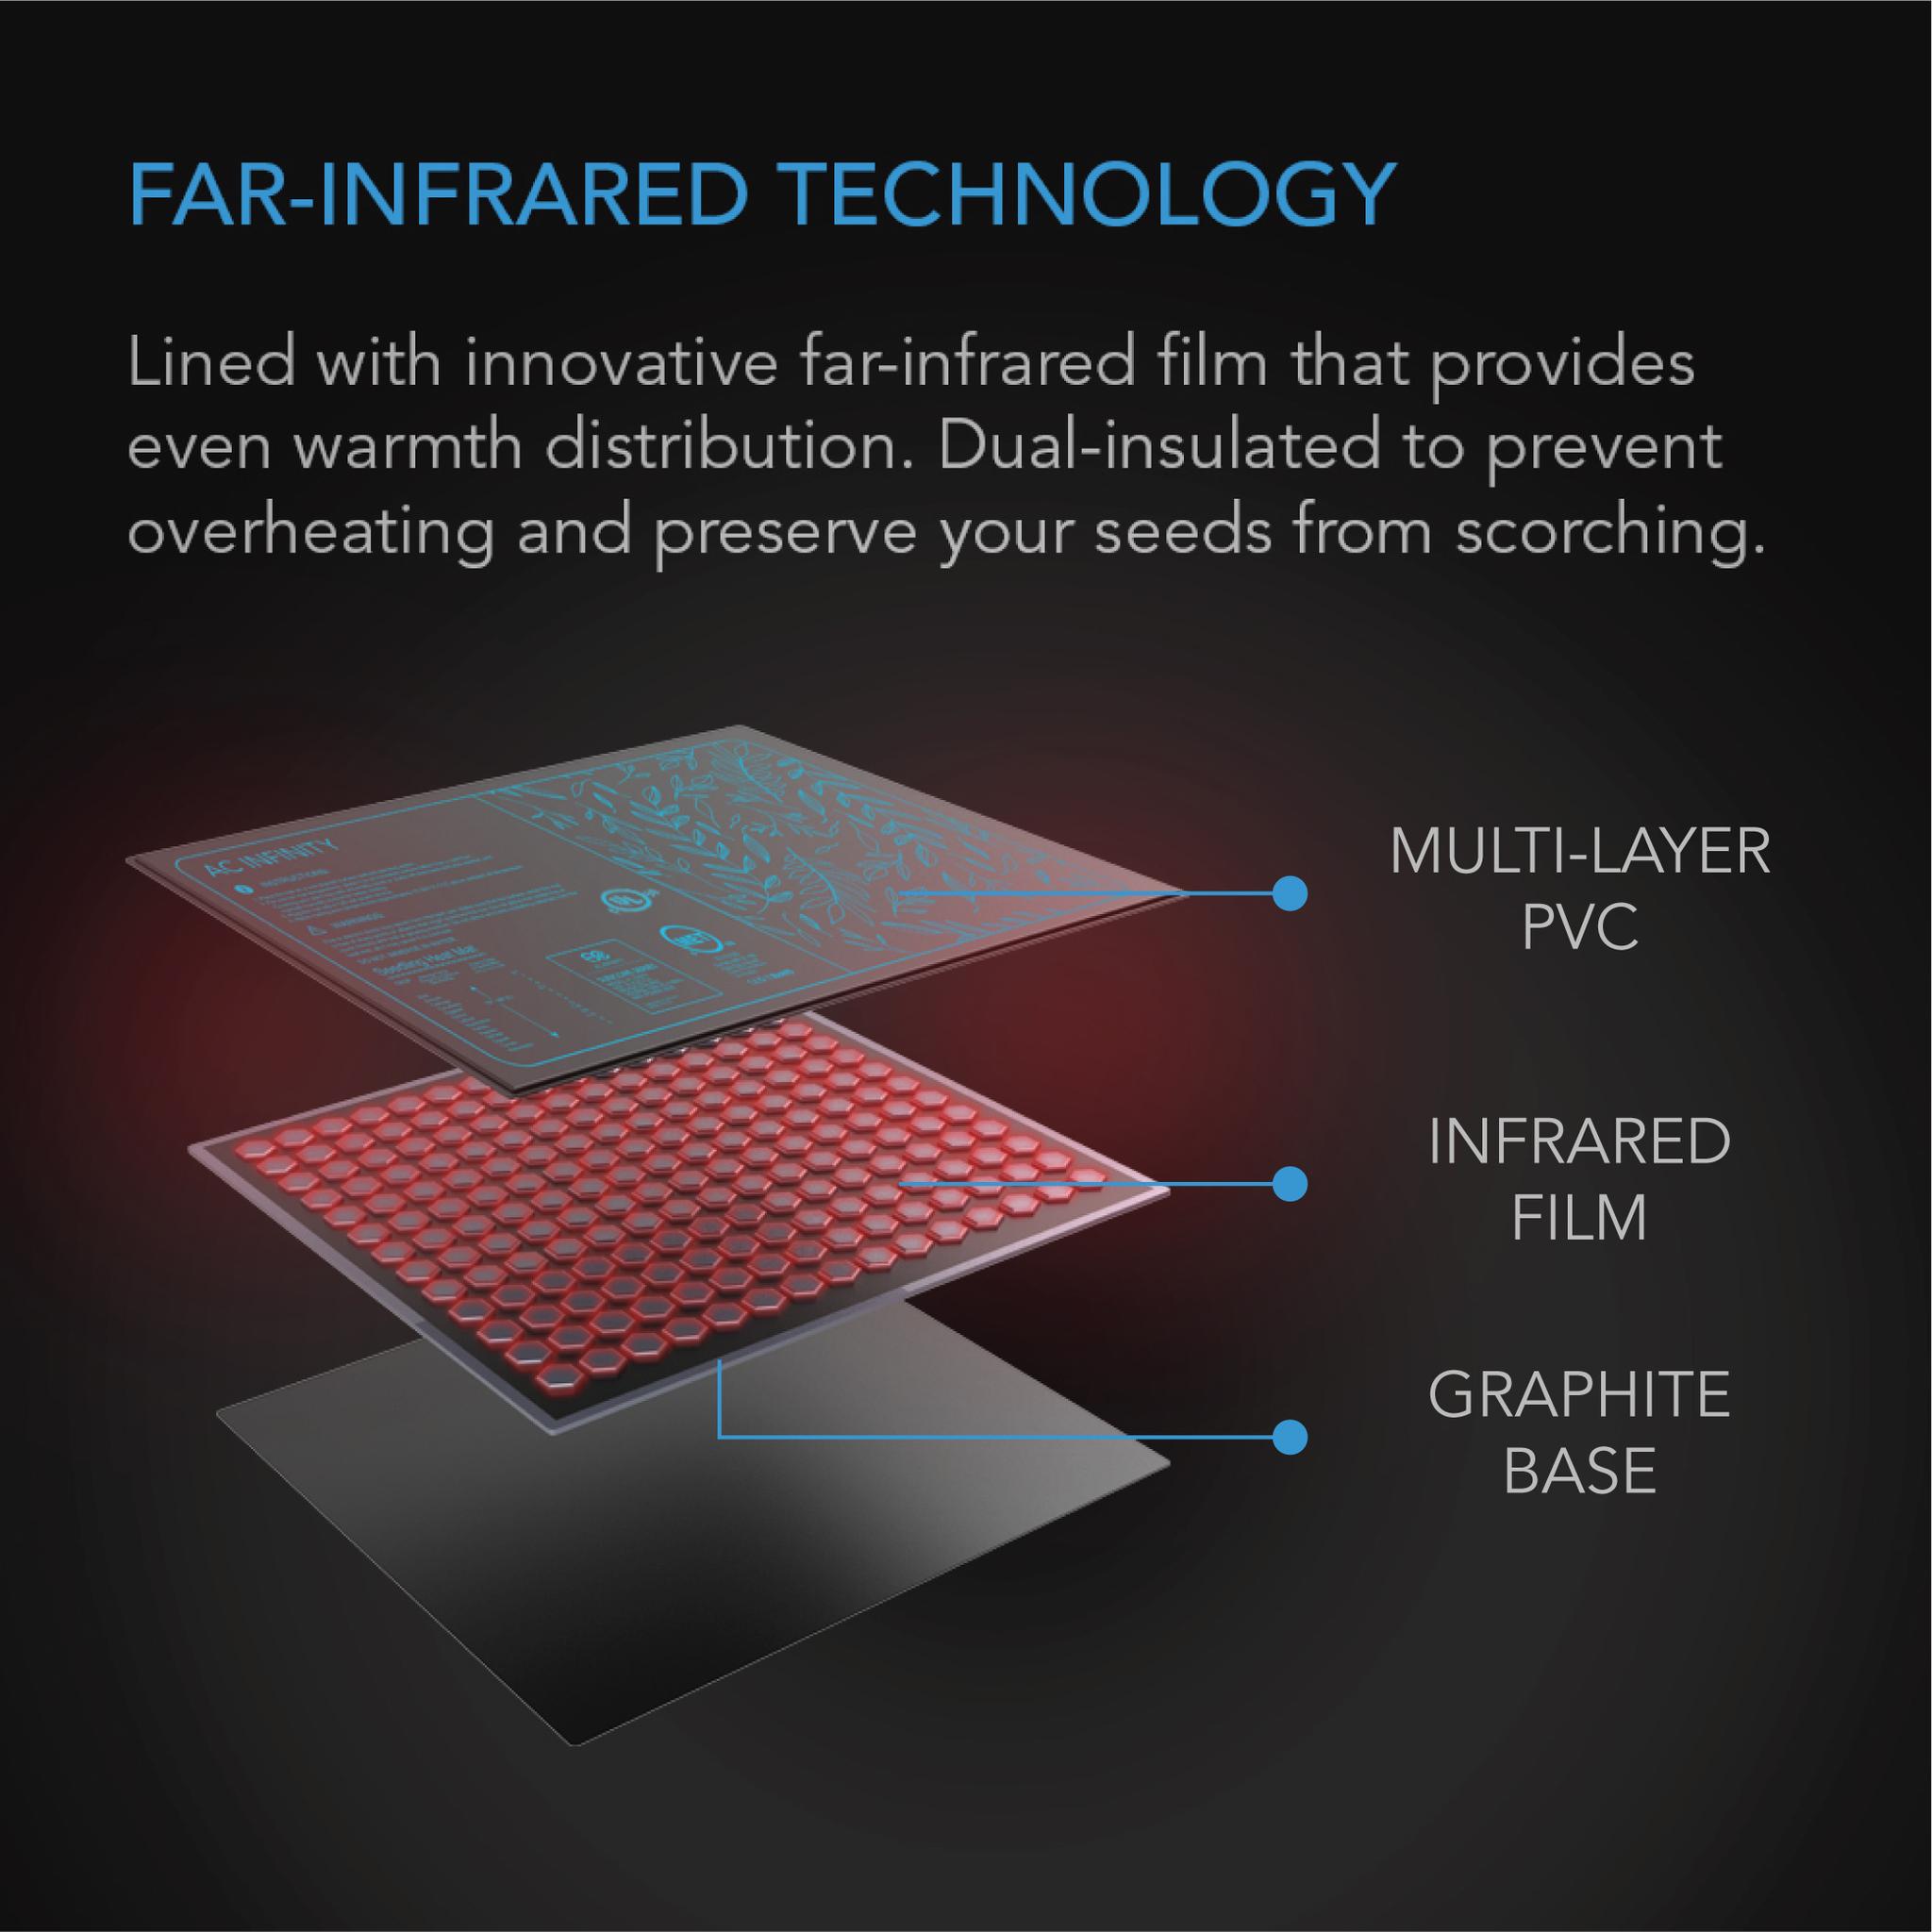 Far-infrared technology